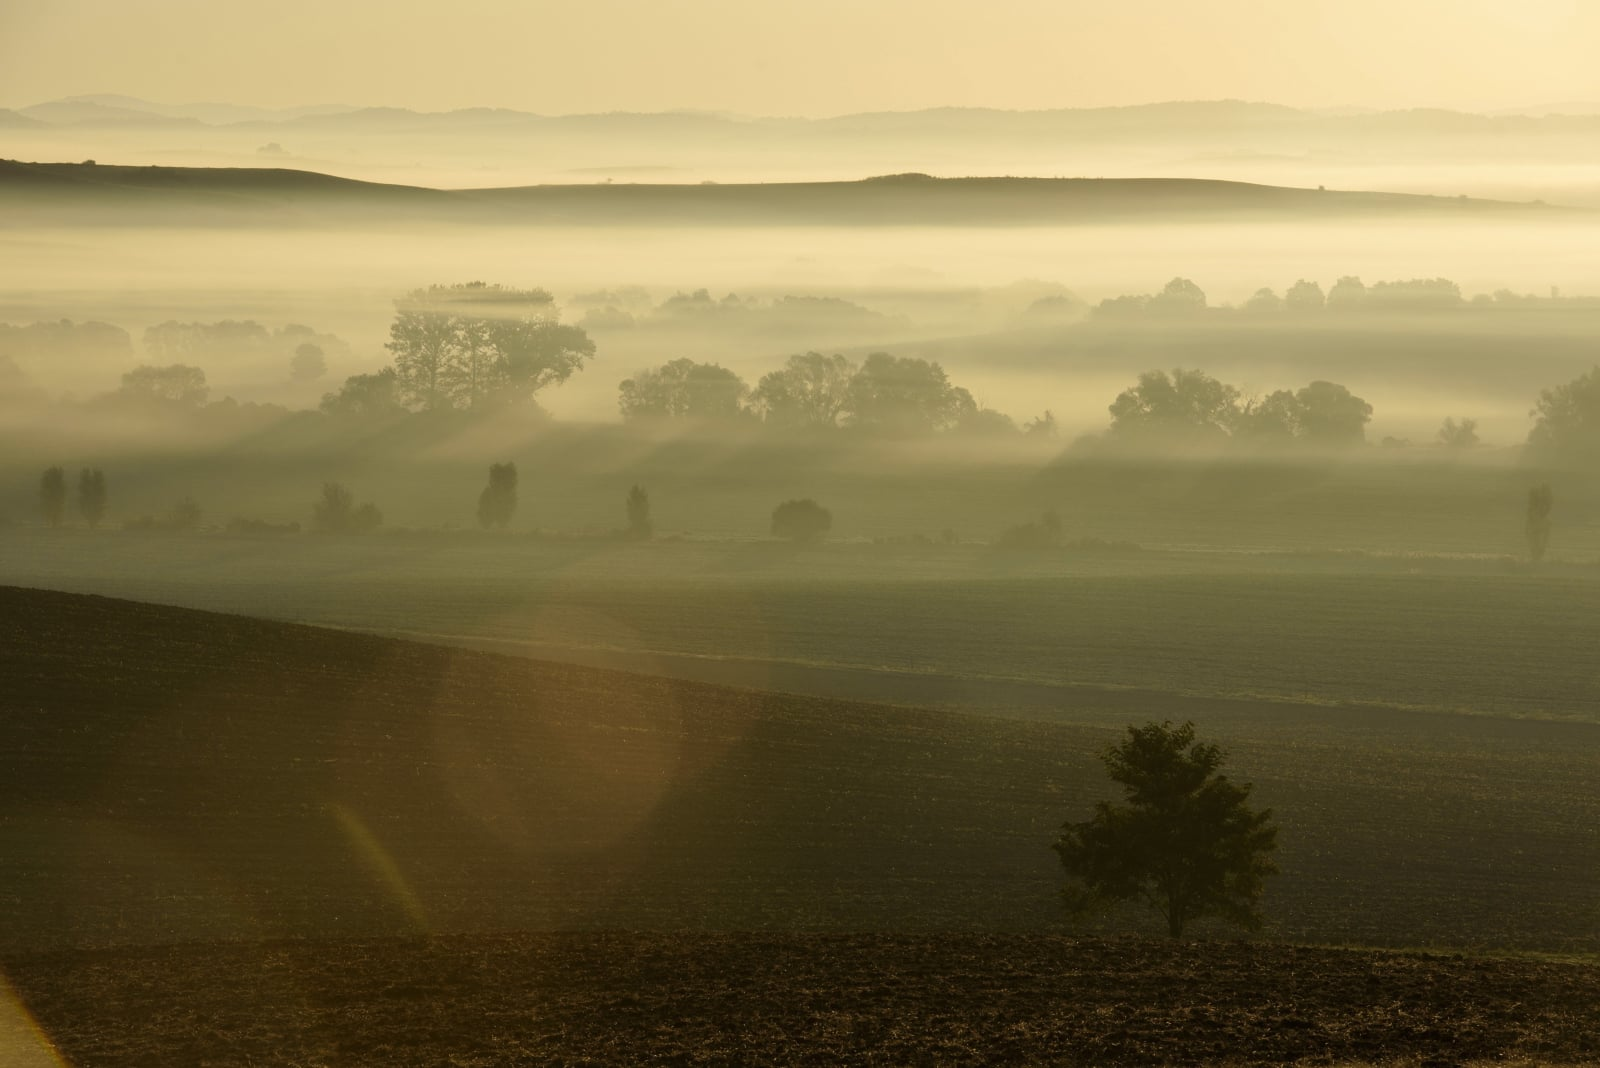 Jesień na Słowacji EPA/PETER KOMKA